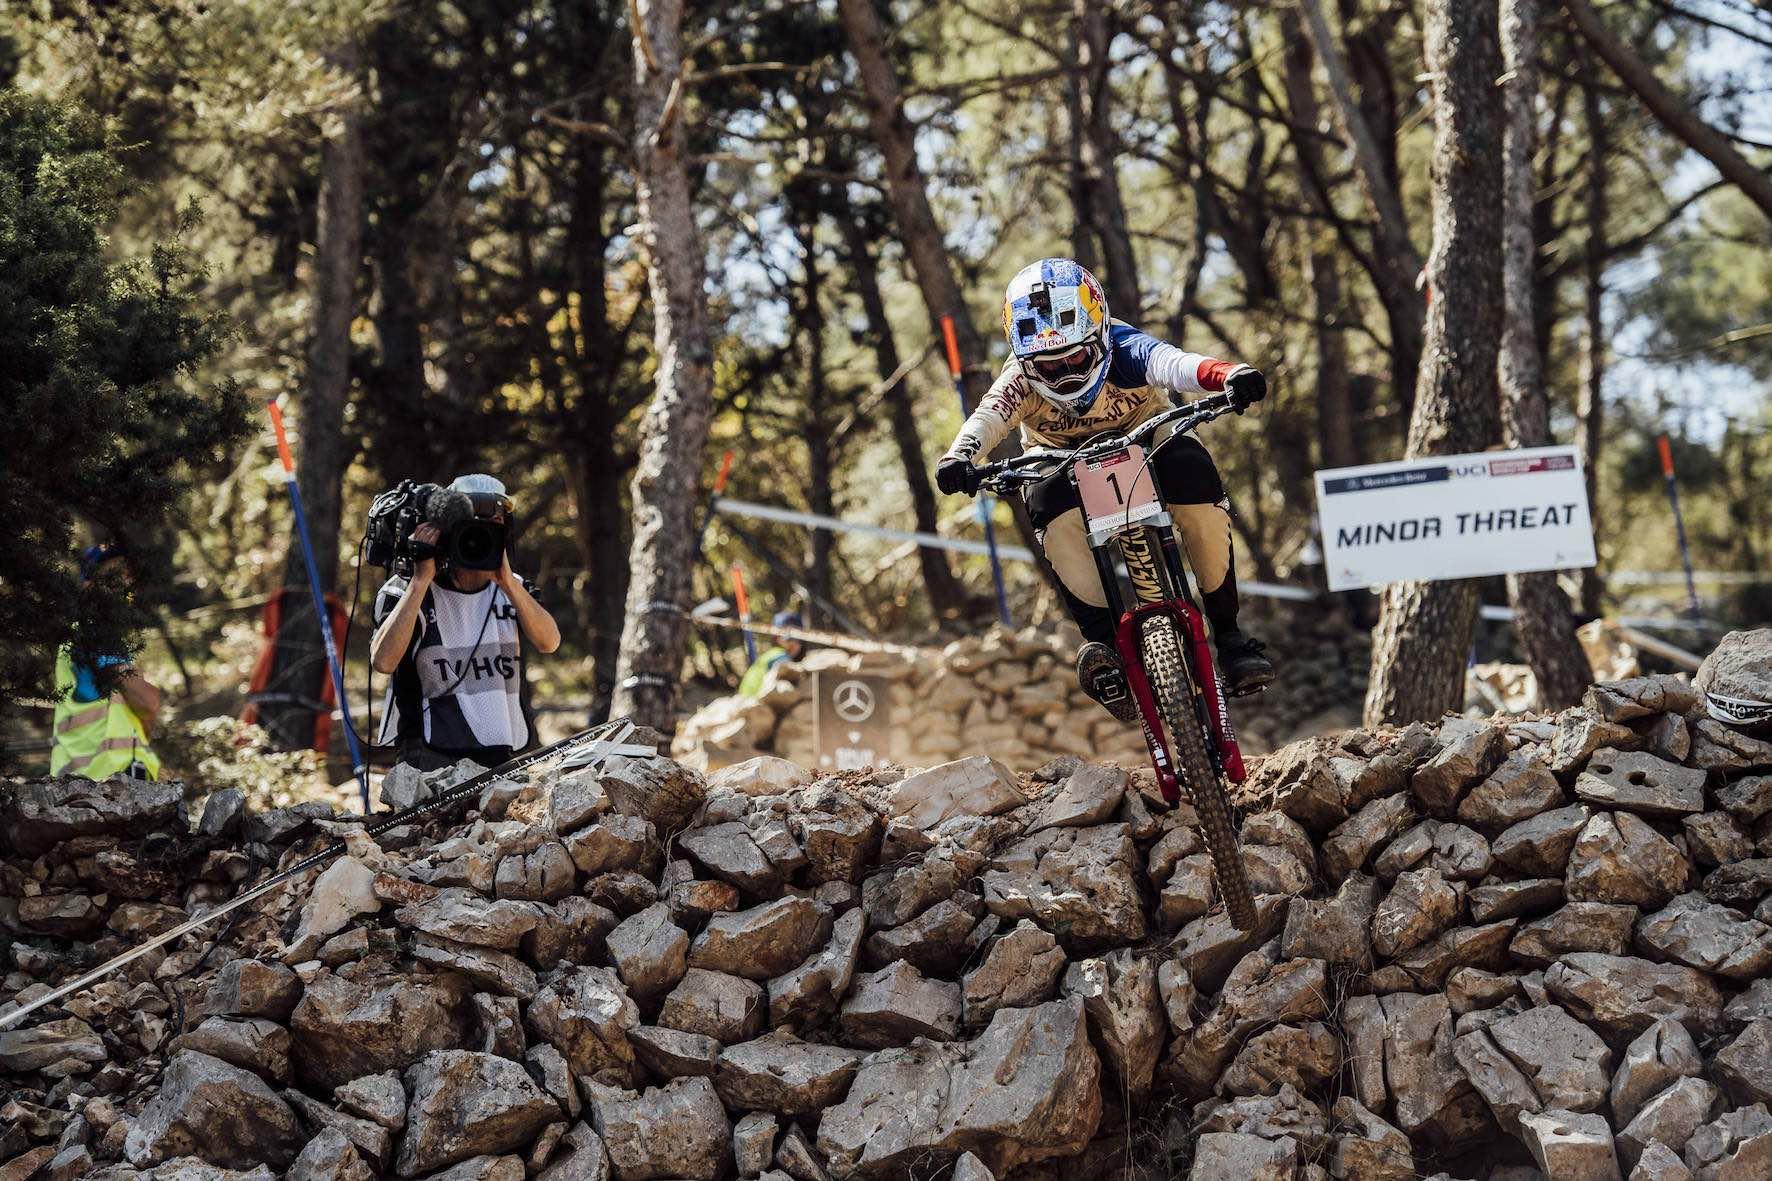 Myriam Nicole wins the 2018 Downhill MTB World Cup in Losinj, Croatia